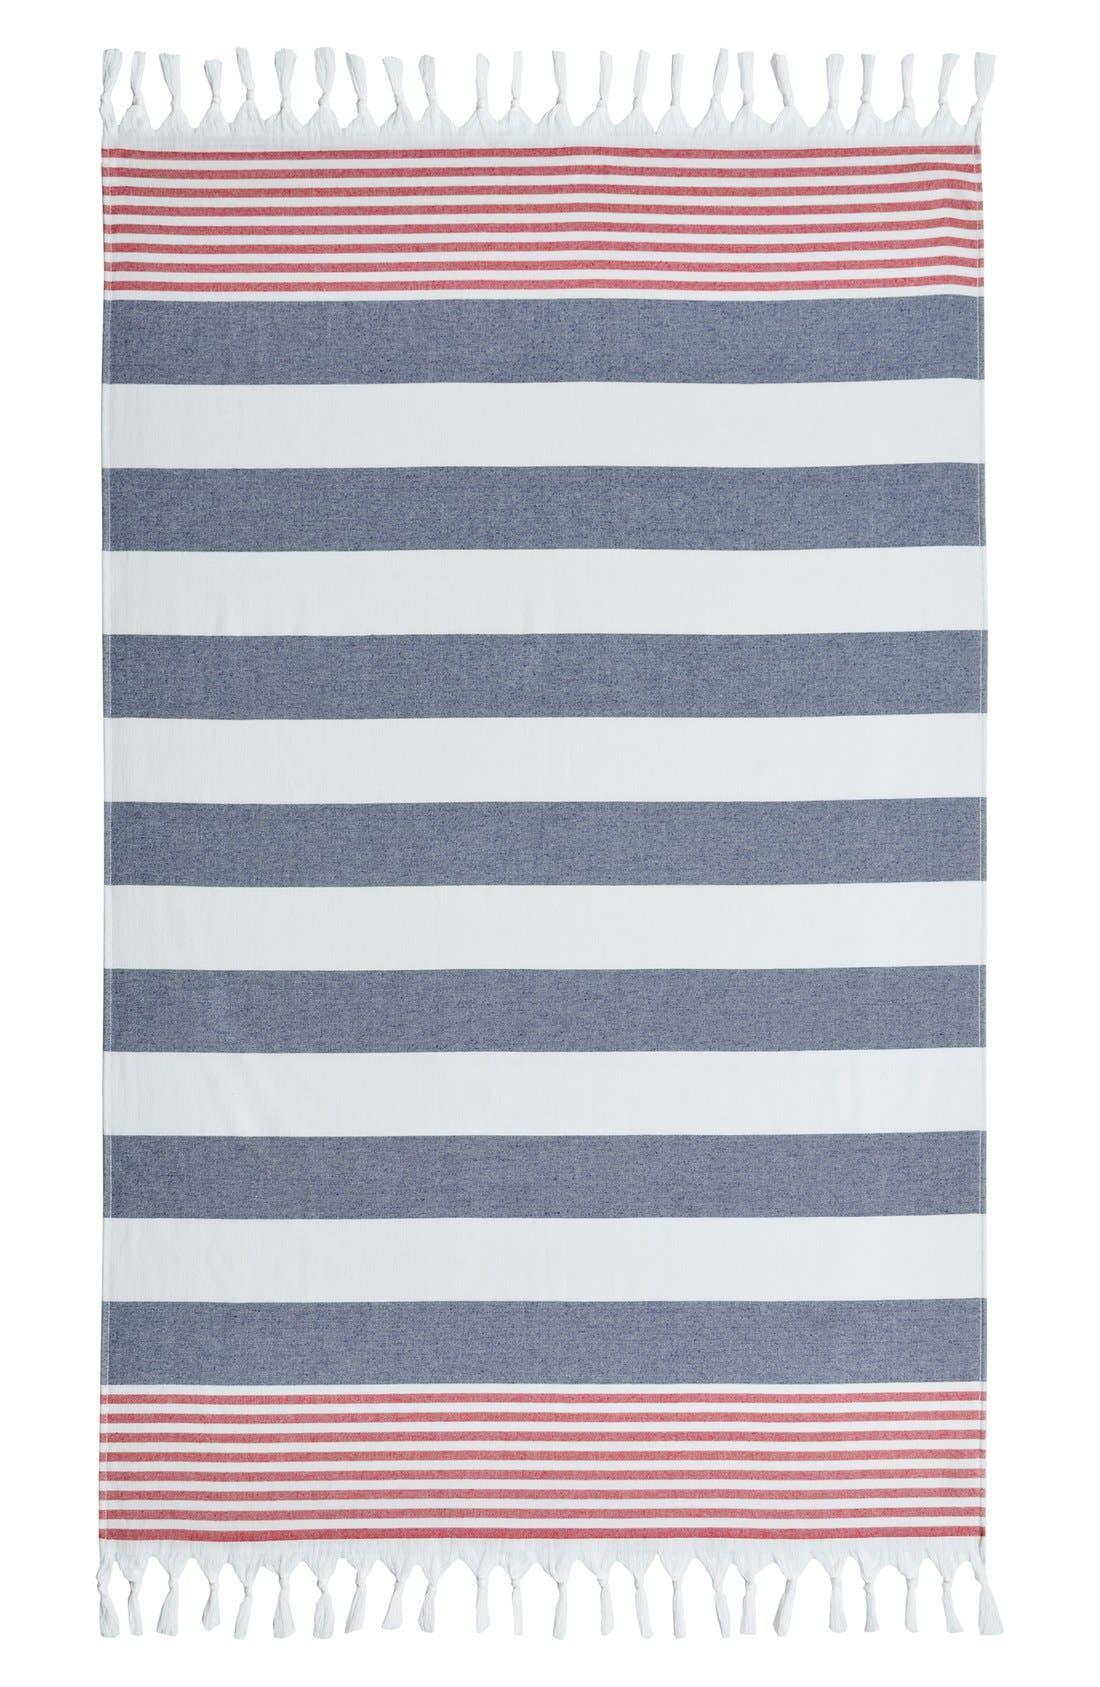 'Patriotic' Turkish Pestemal Towel,                             Alternate thumbnail 2, color,                             Ocean Blue